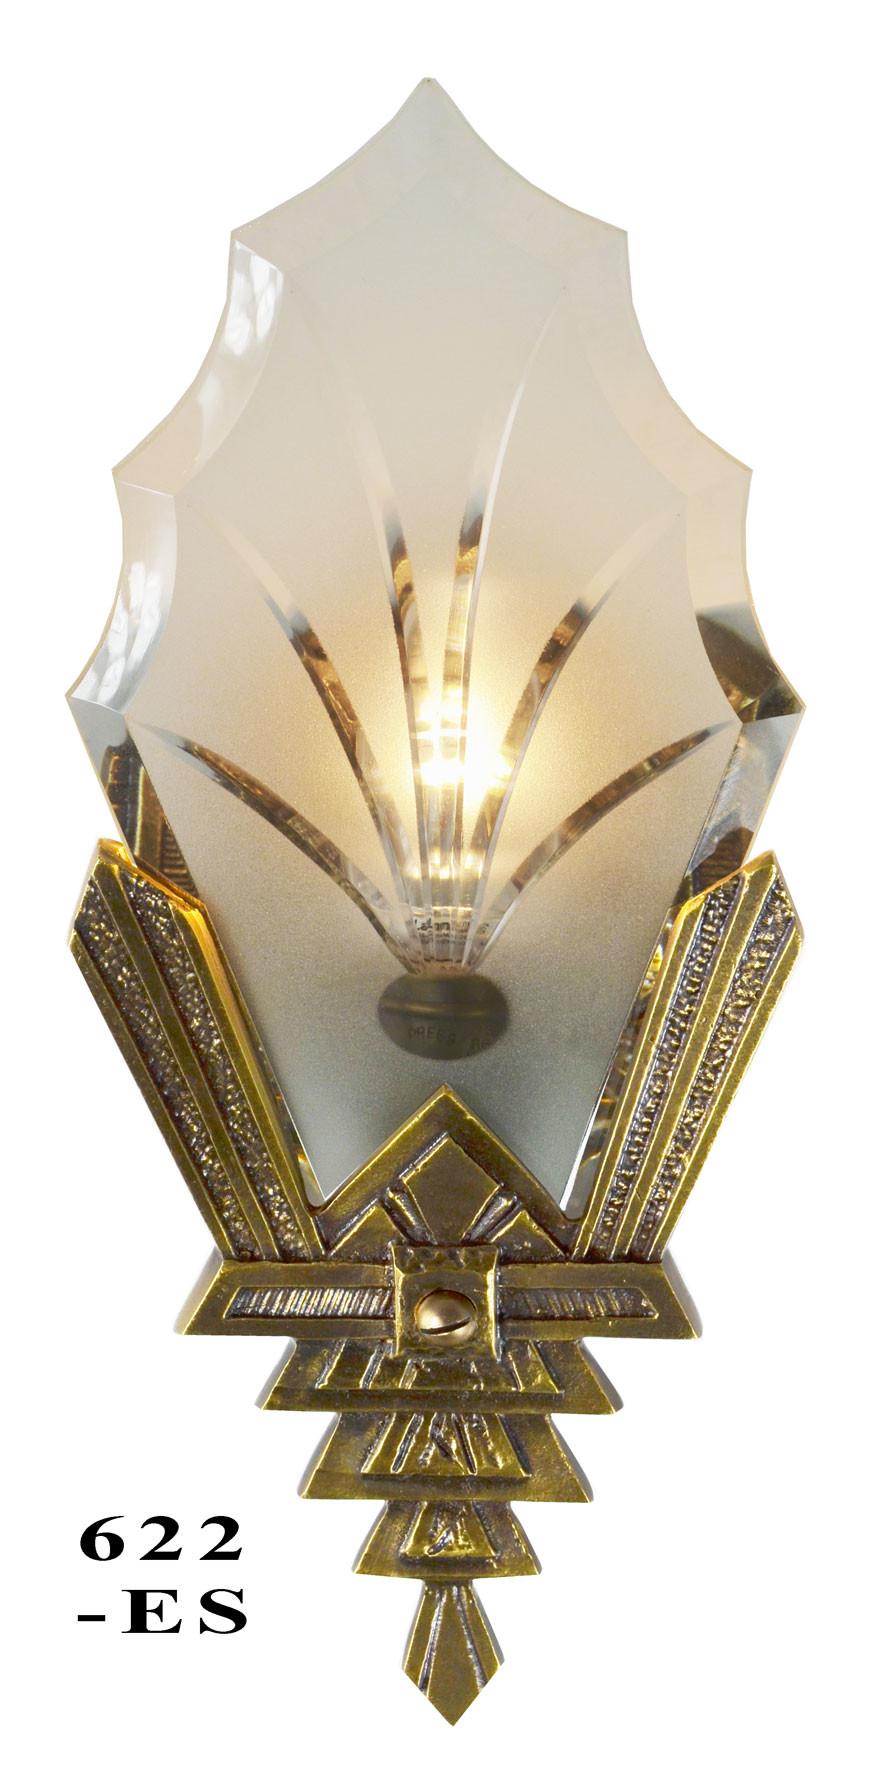 Art Deco Glass Wall Sconces : Vintage Hardware & Lighting - Art Deco Wall Sconces Cut Glass Lighting (622-ES)